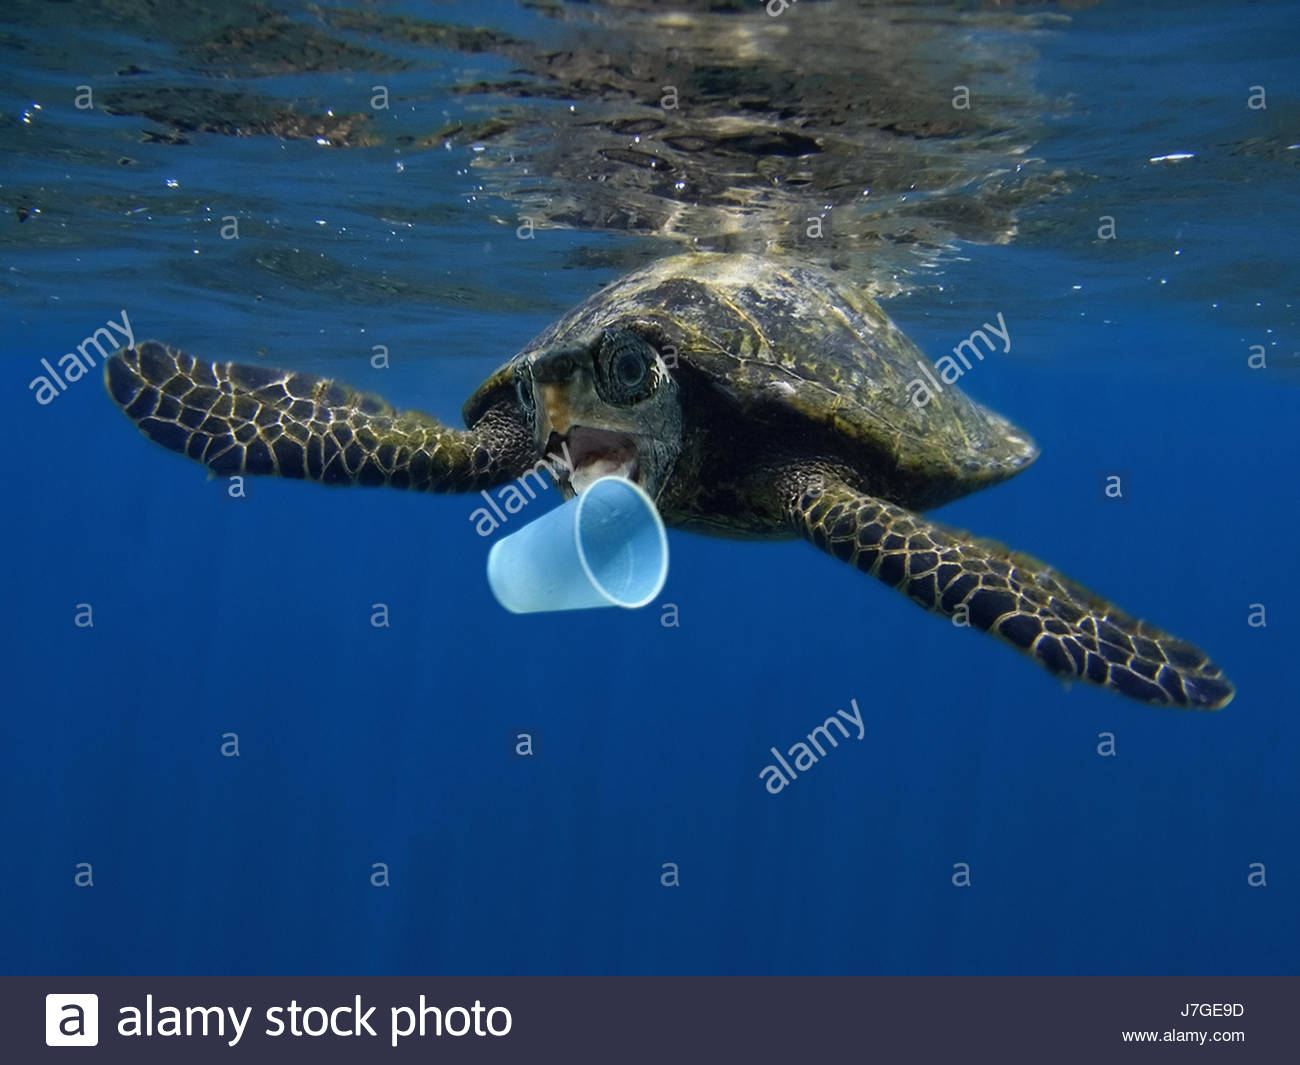 Kids Eating Turtles